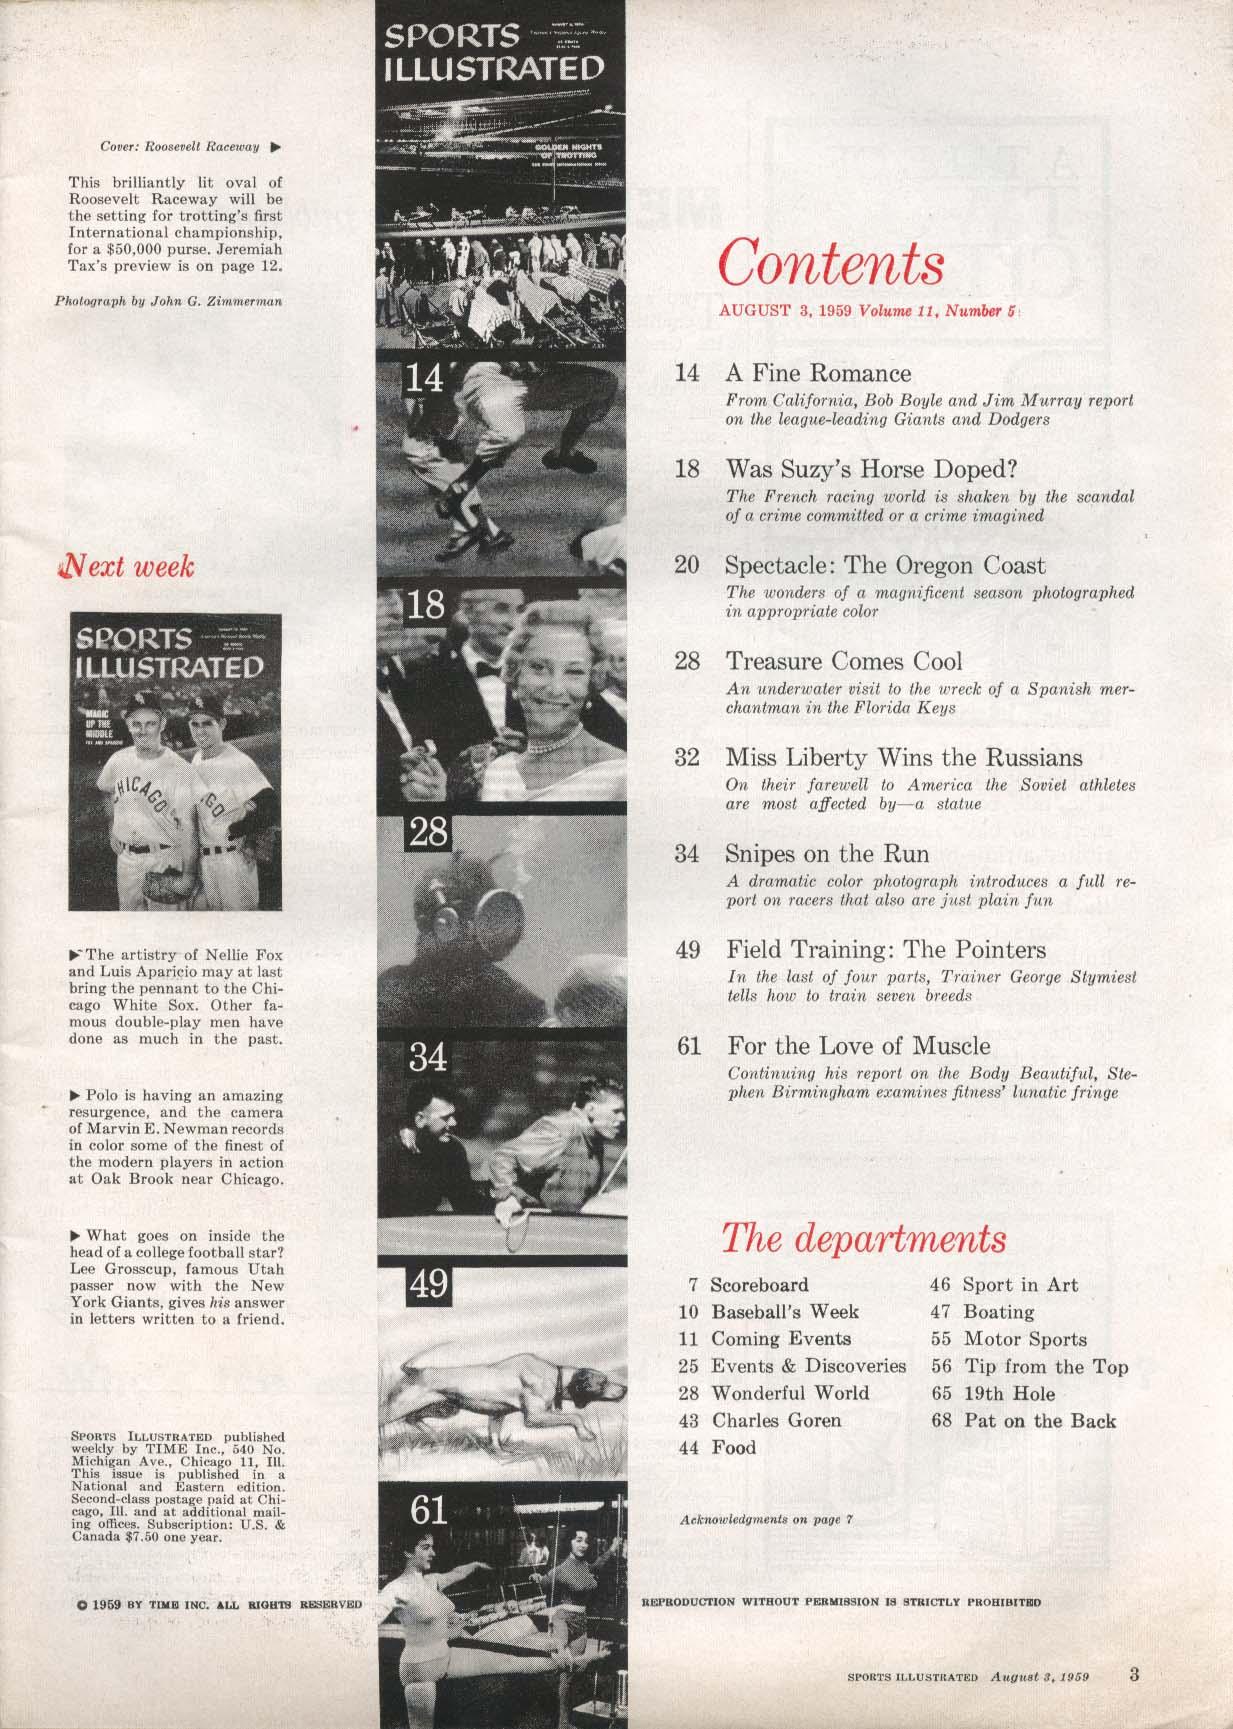 SPORTS ILLUSTRATED Bob Boyle Jim Murray Stephen Birmingham 8/3 1959